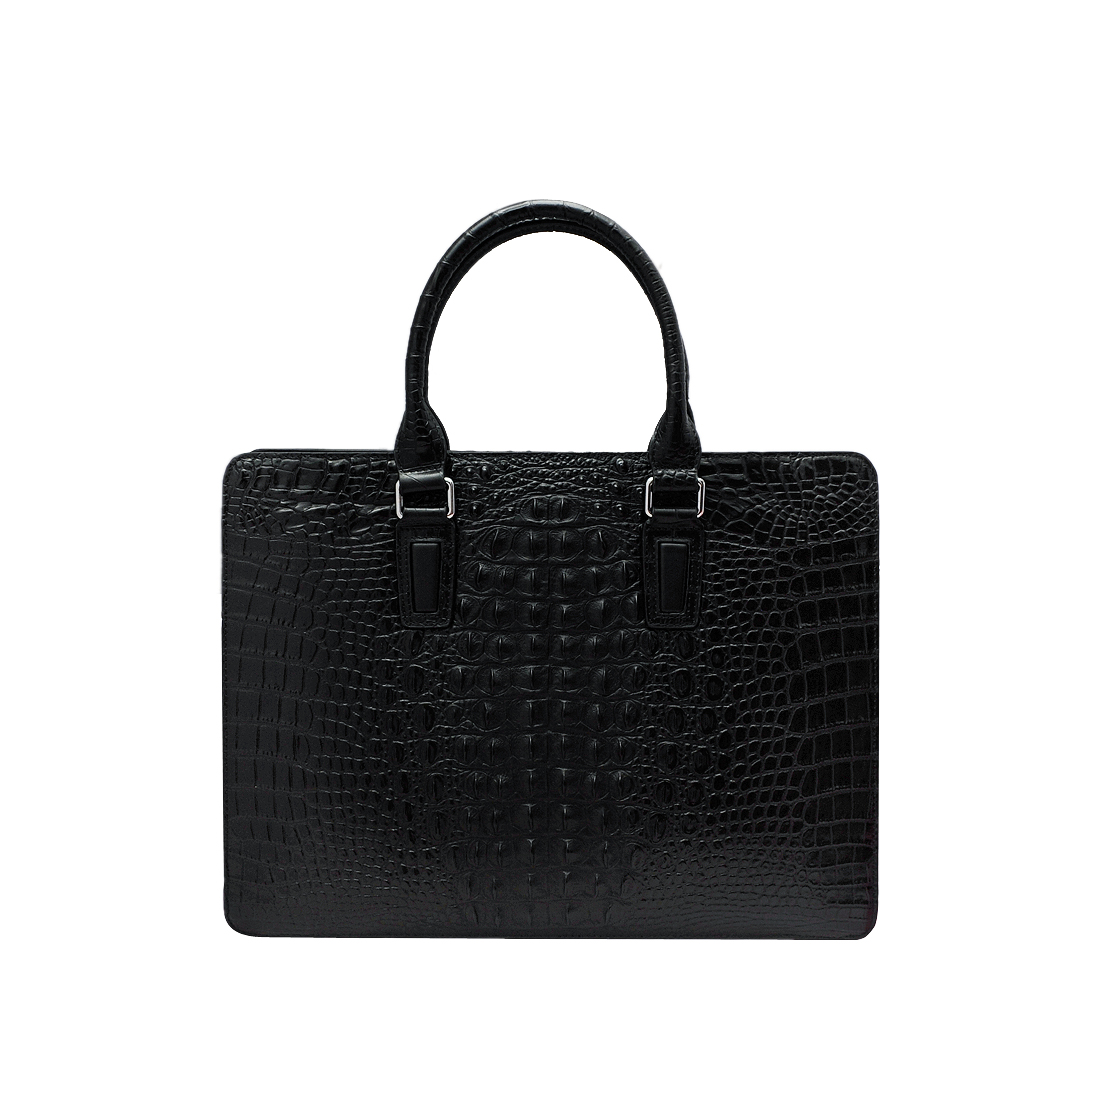 Túi xách nam da bò thật cao cấp màu đen ELMI ET921